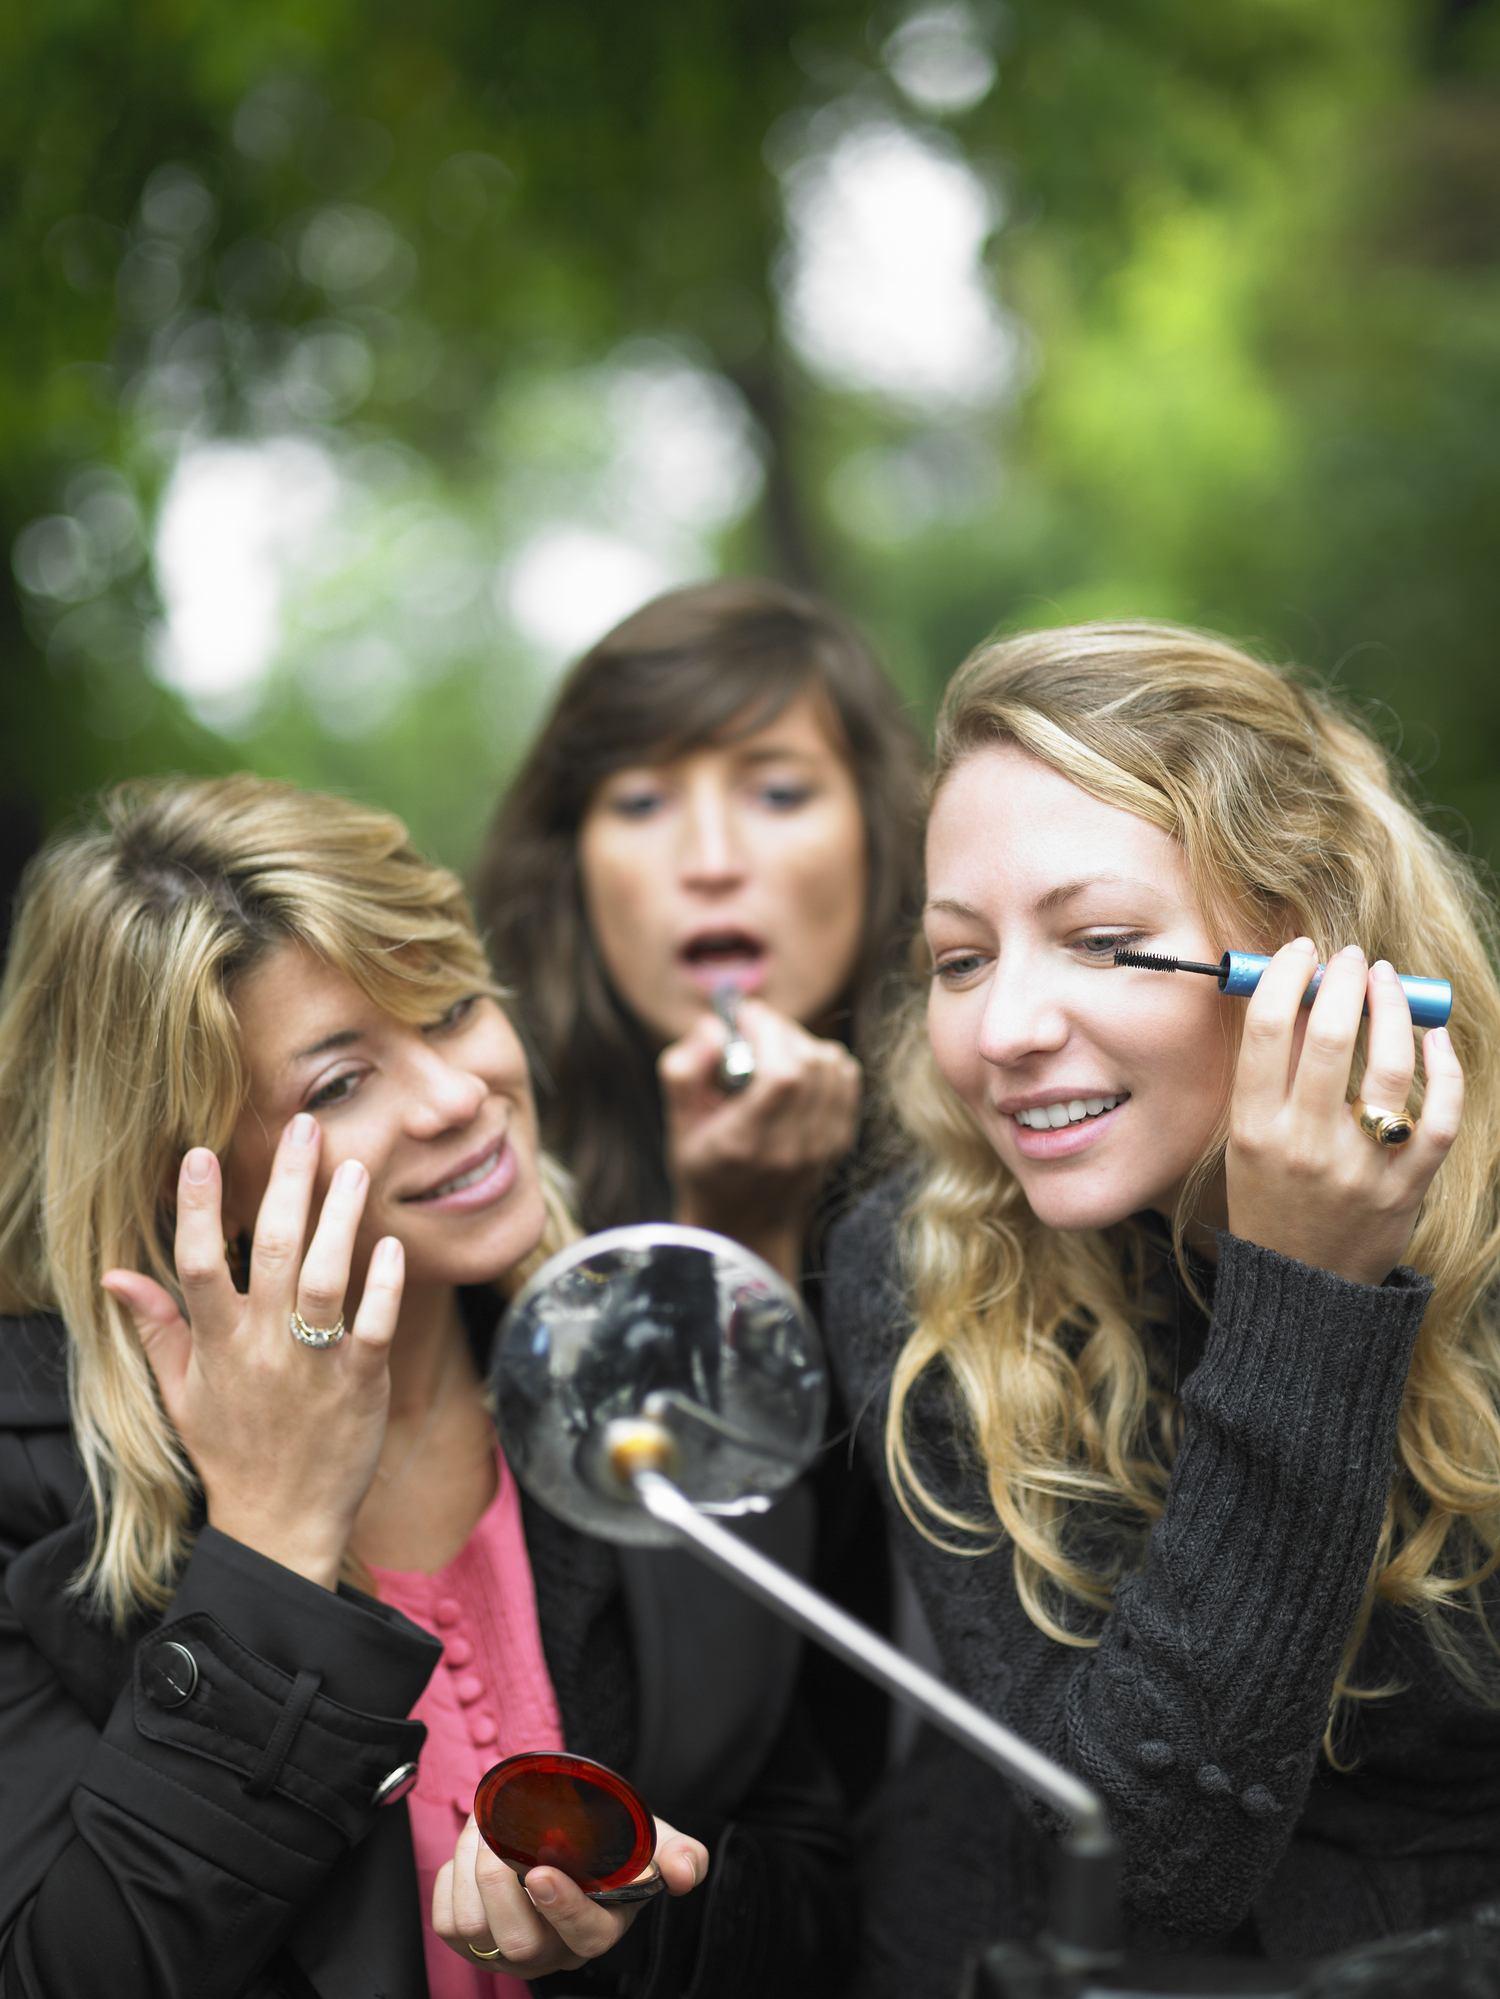 Friends applying makeup